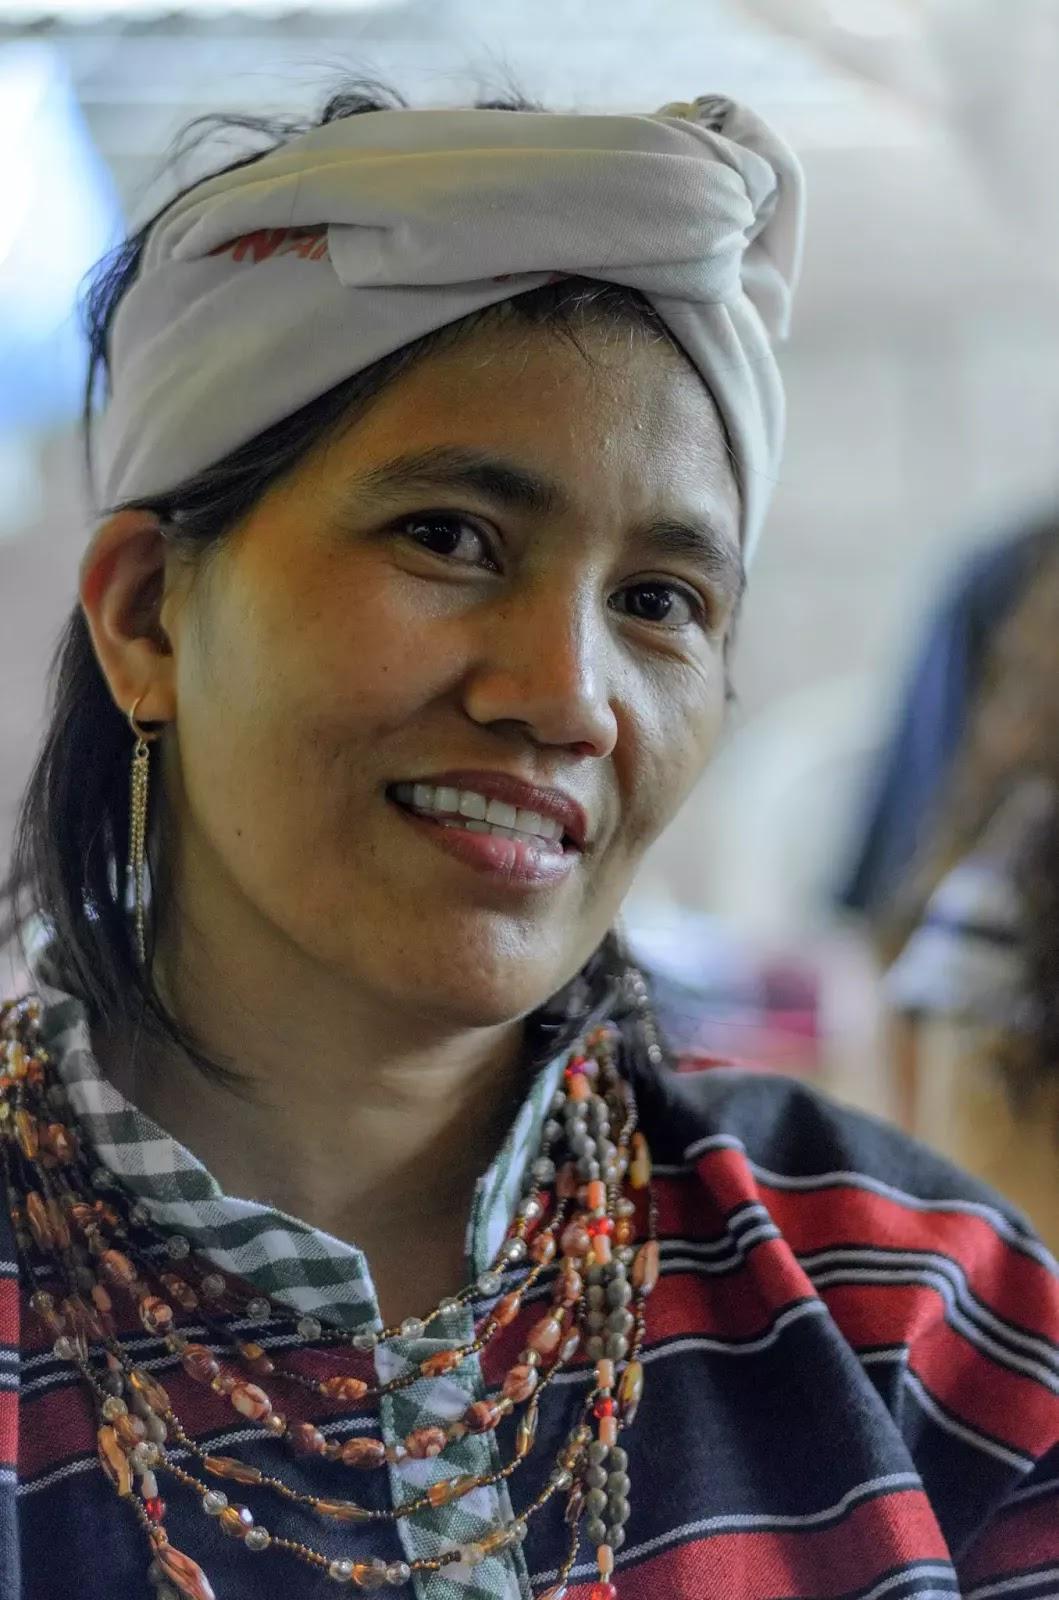 Benguet Cordillera Administrative Region Philippines Ethno-Indigenous Woman